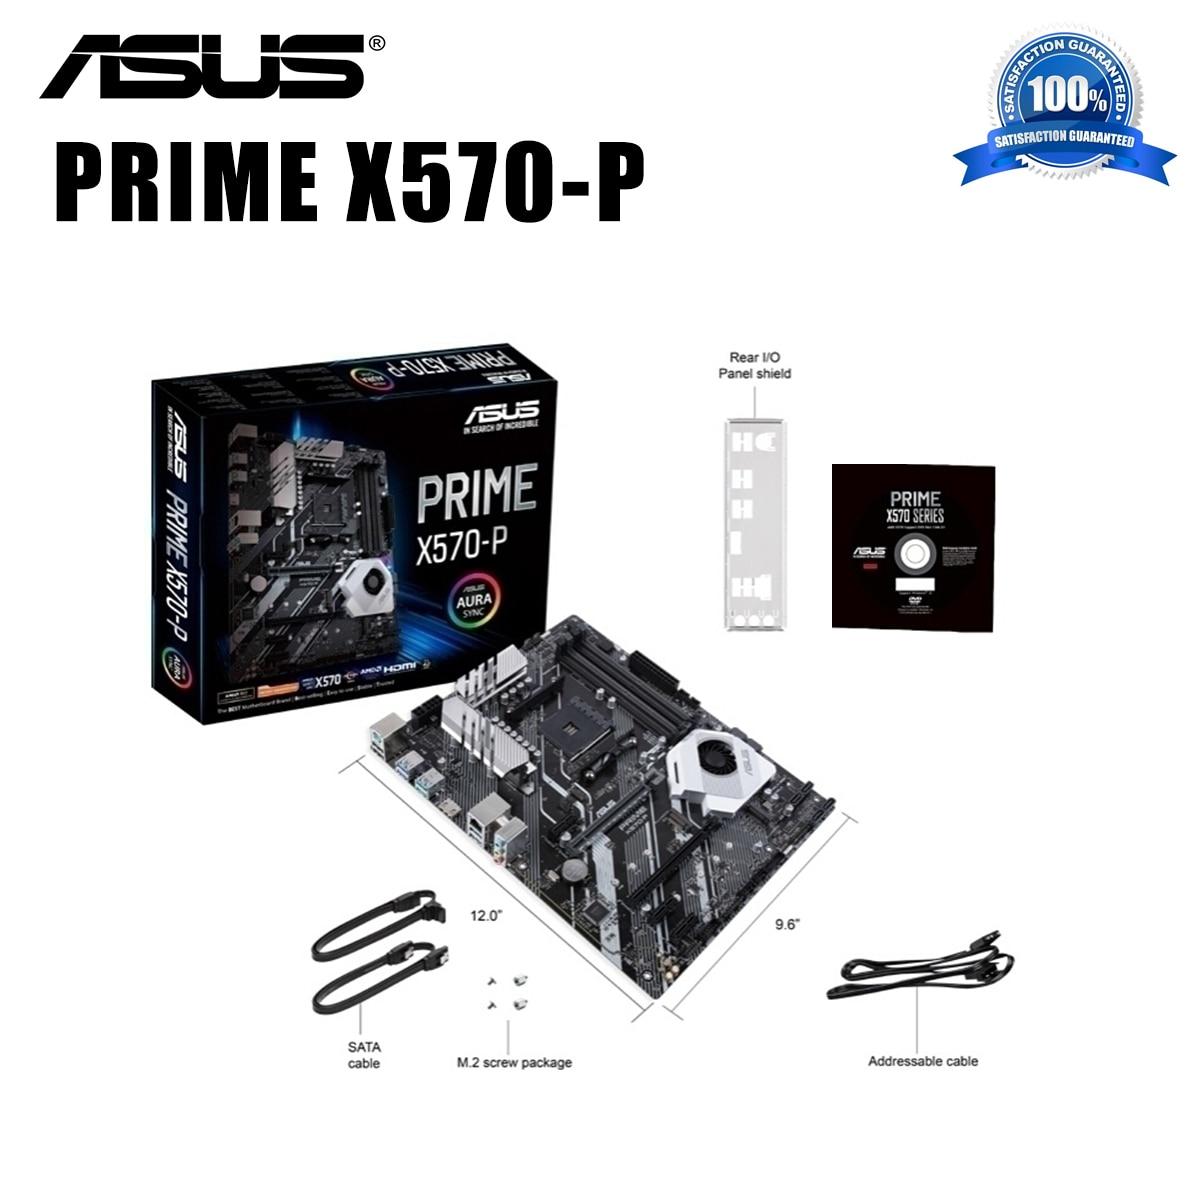 LGA 2011-3 Asus Z10PE-D16 WS Motherboard IPMI 2.0 Intel C612 PCH M.2 SSD High Speed Desktop C612 Placa-mãe 2011-3 Workstation